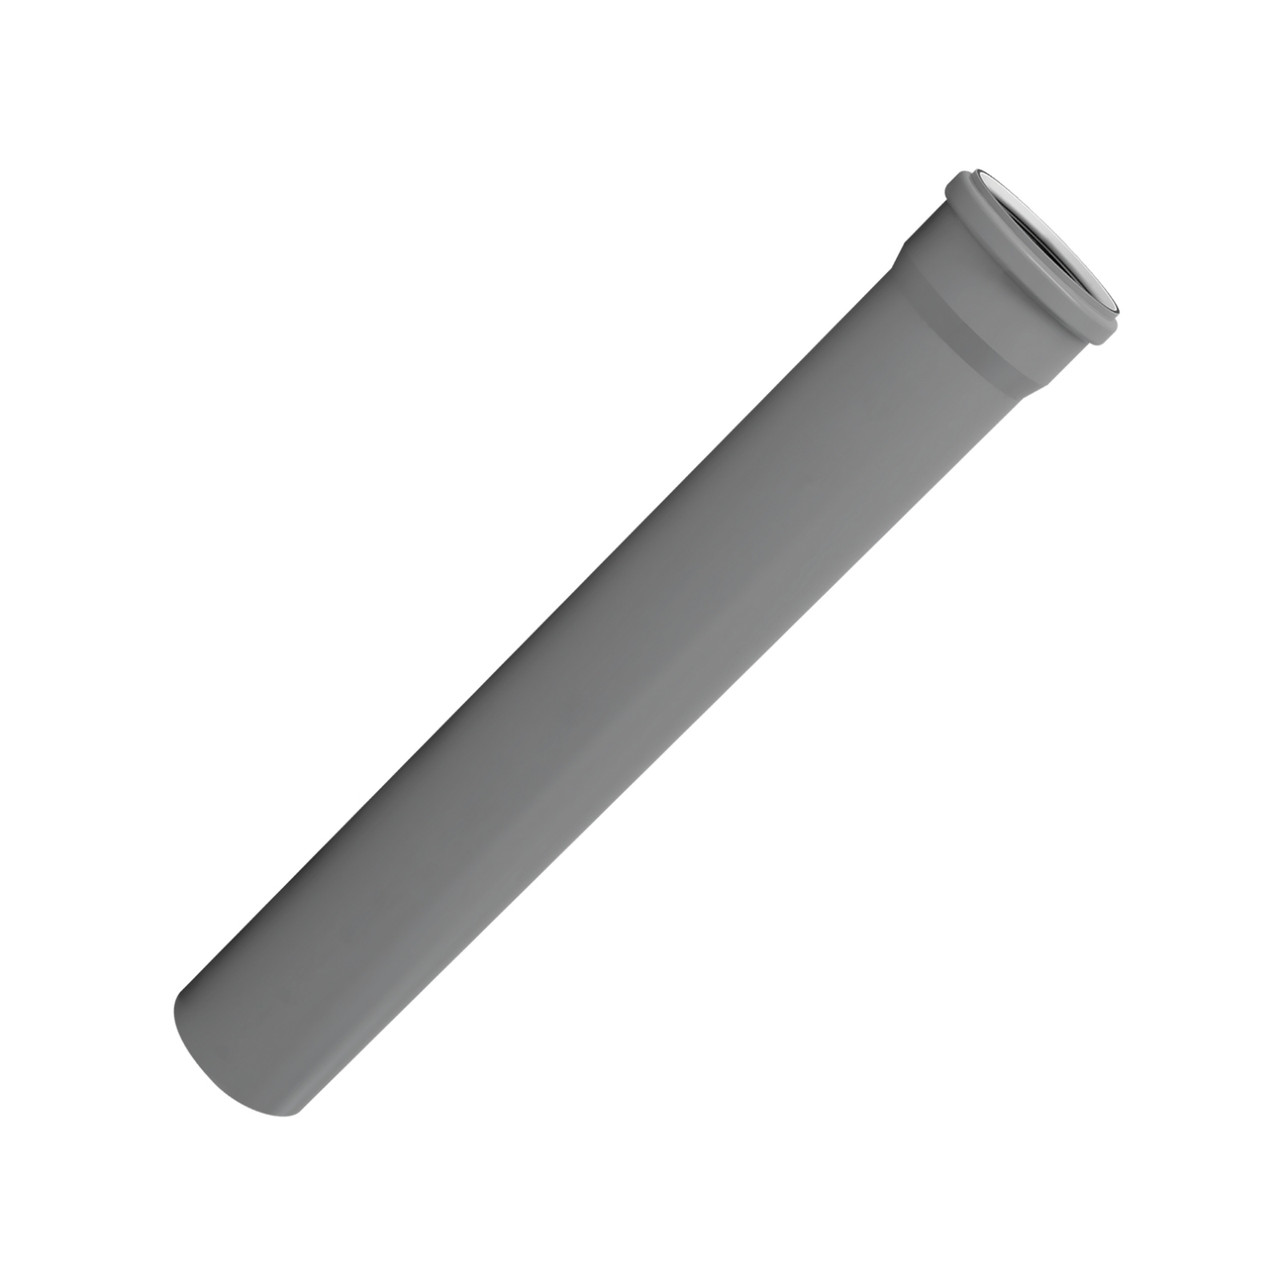 Труба с раструбом VALSIR PP3® Ø32 L=250 мм 17 dB(A)